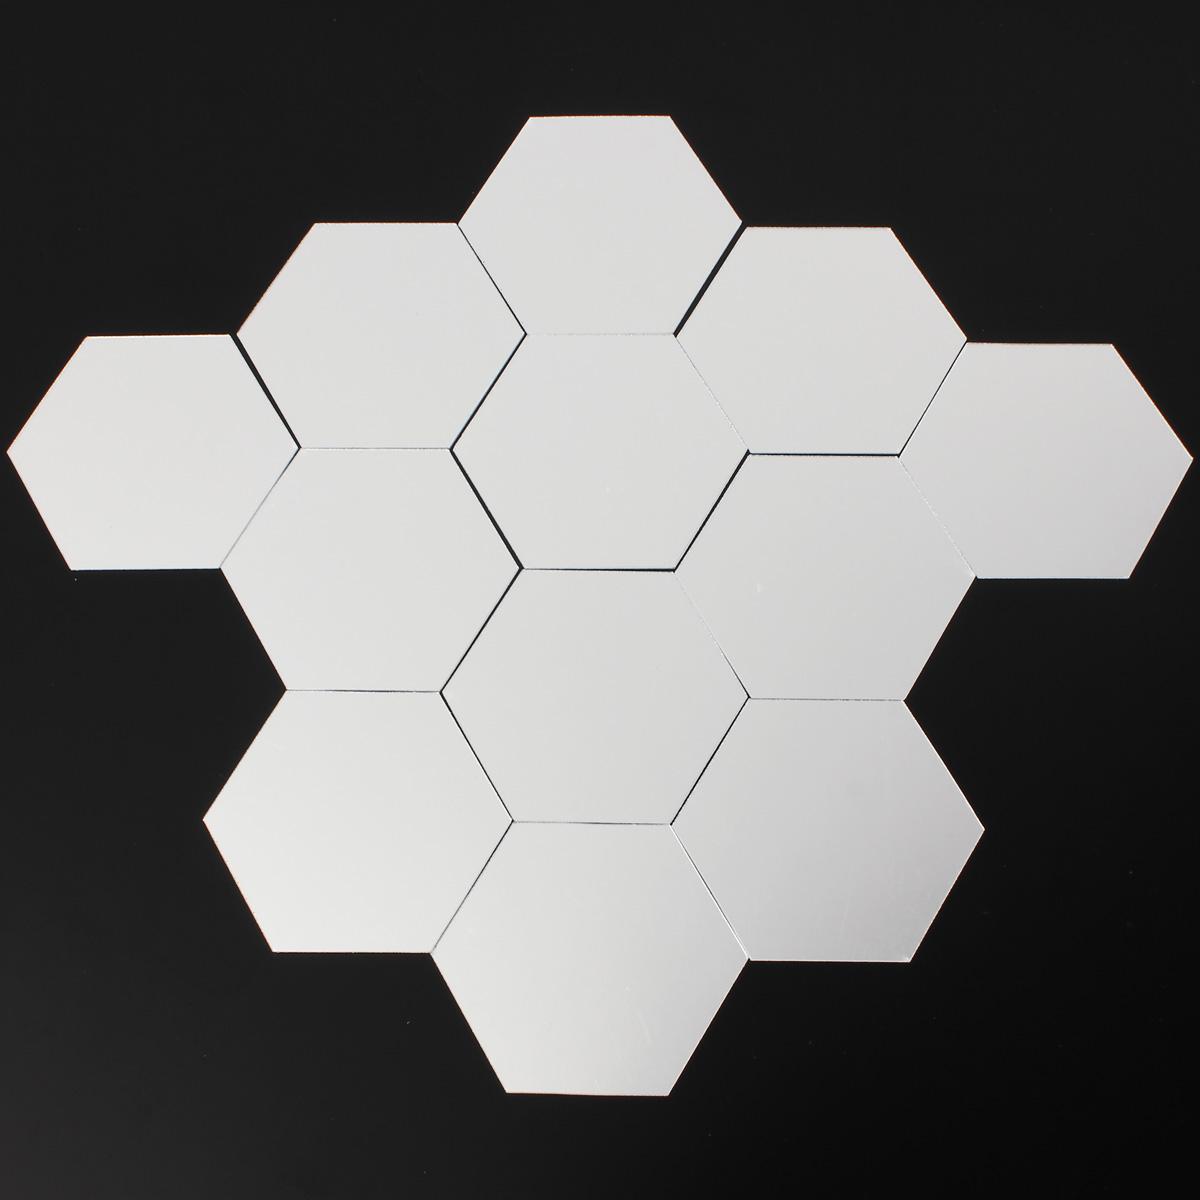 Details about 12PCS 3D MIRROR EFFECT GEOMETRIC HEXAGON ACRYLIC WALL ...